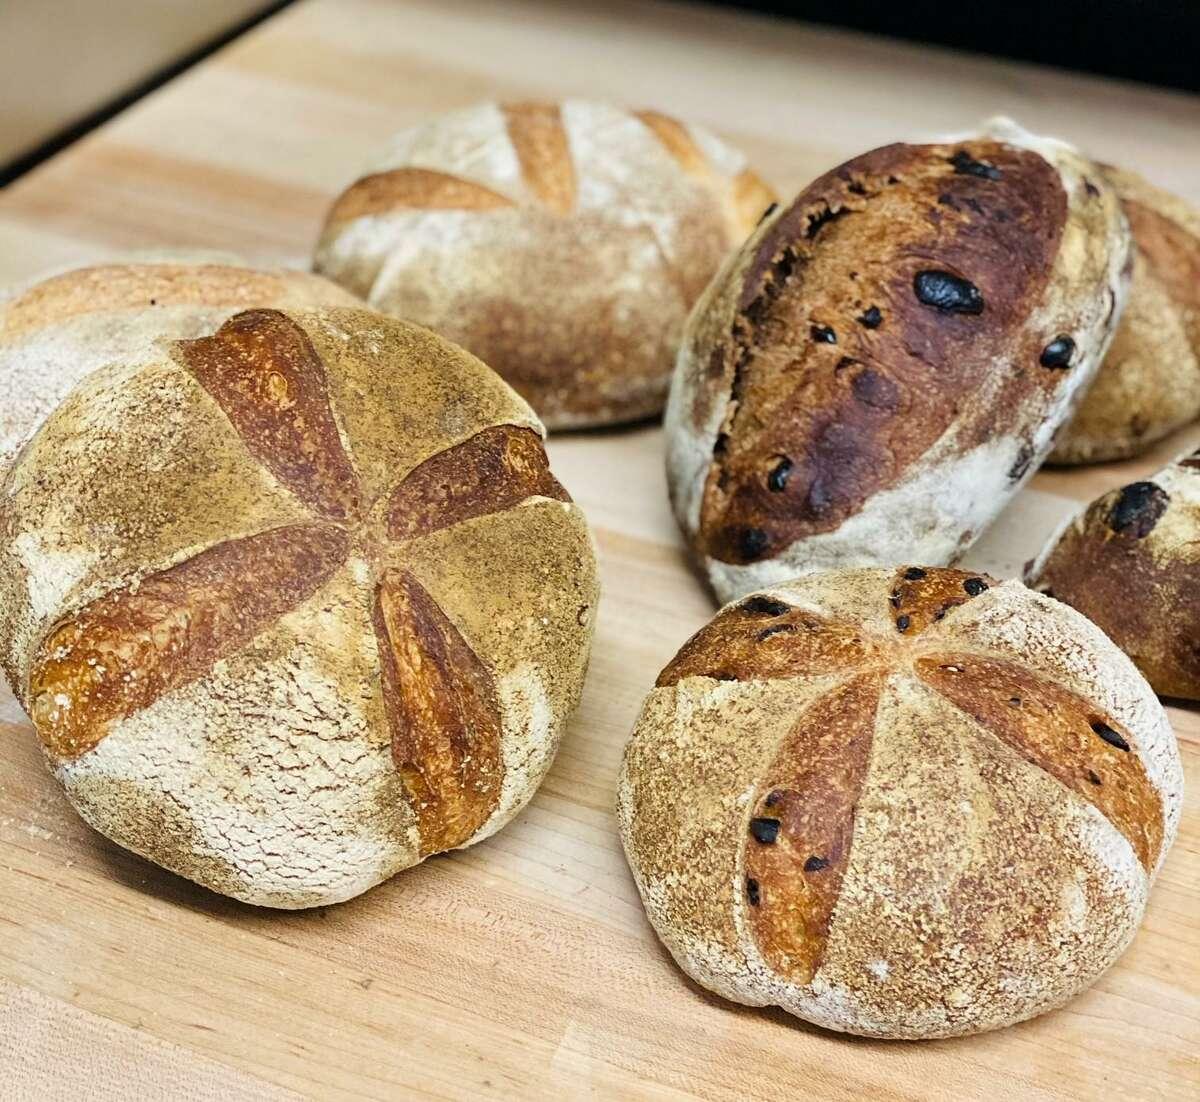 Toscano Bros., a new bakery from Tony Gemignani of Tony's Pizza Napoletana, will serve sourdough loaves and other fresh bread.